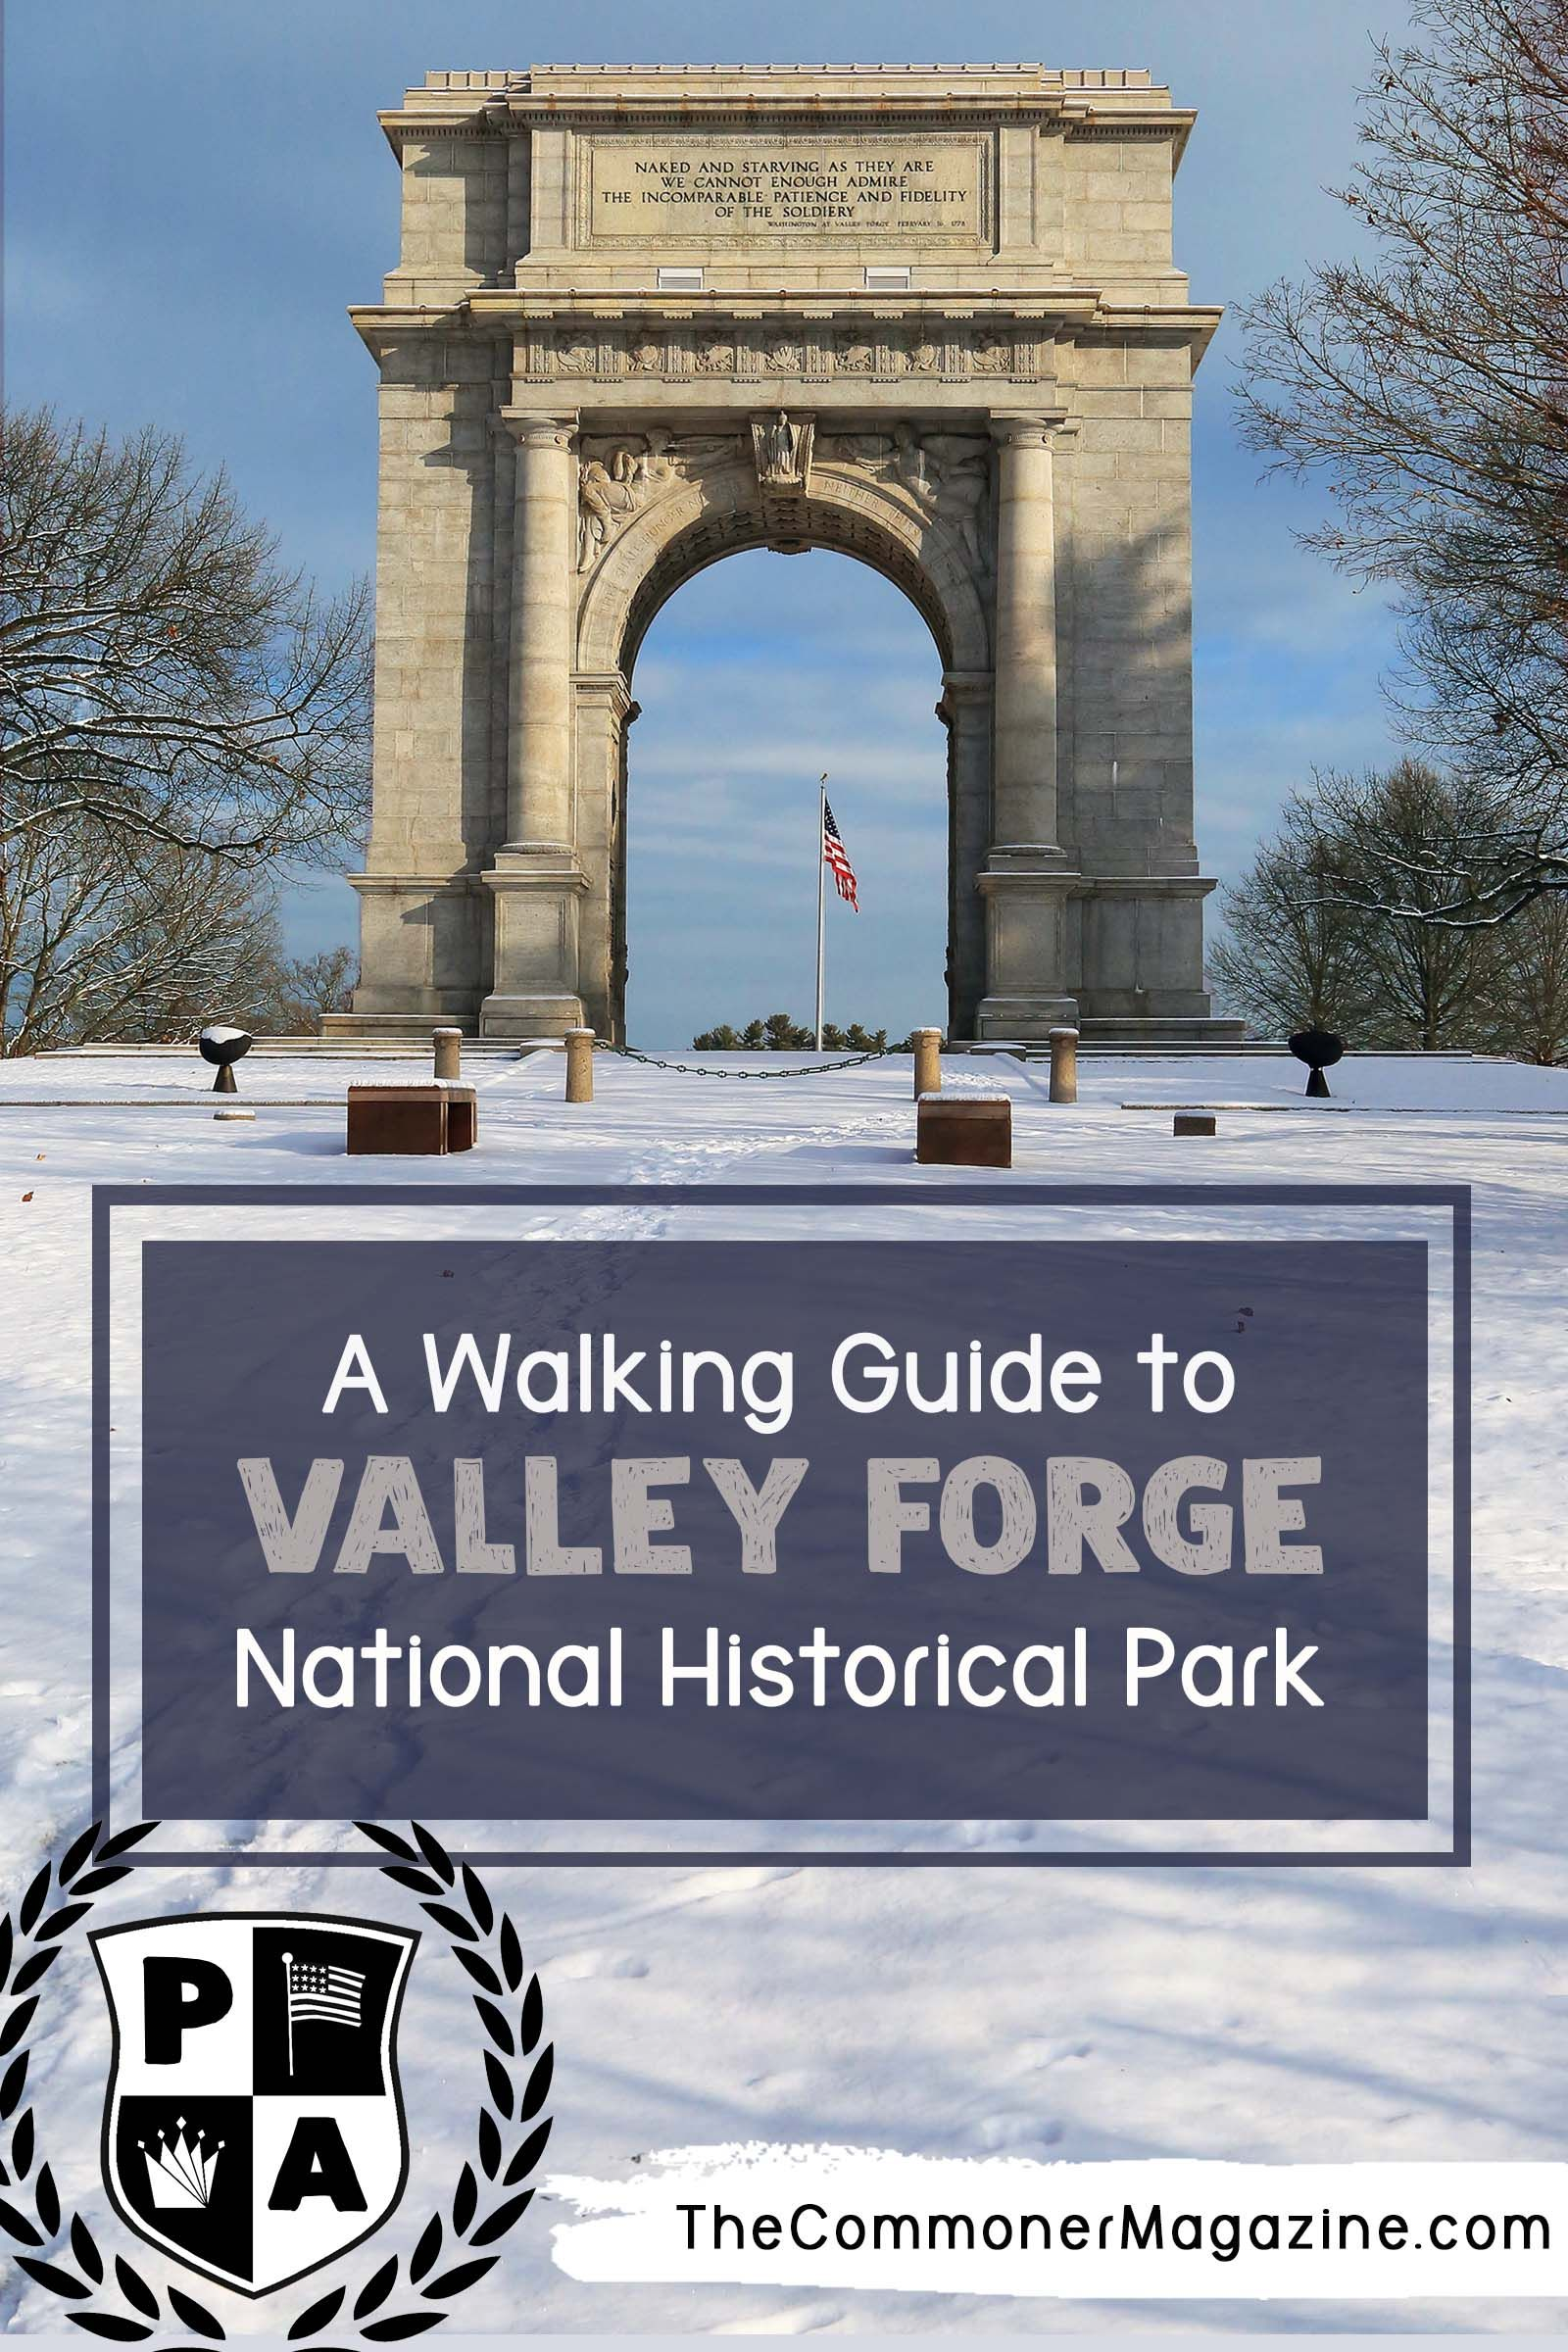 Circumnavigating General Washington's Winter Encampment